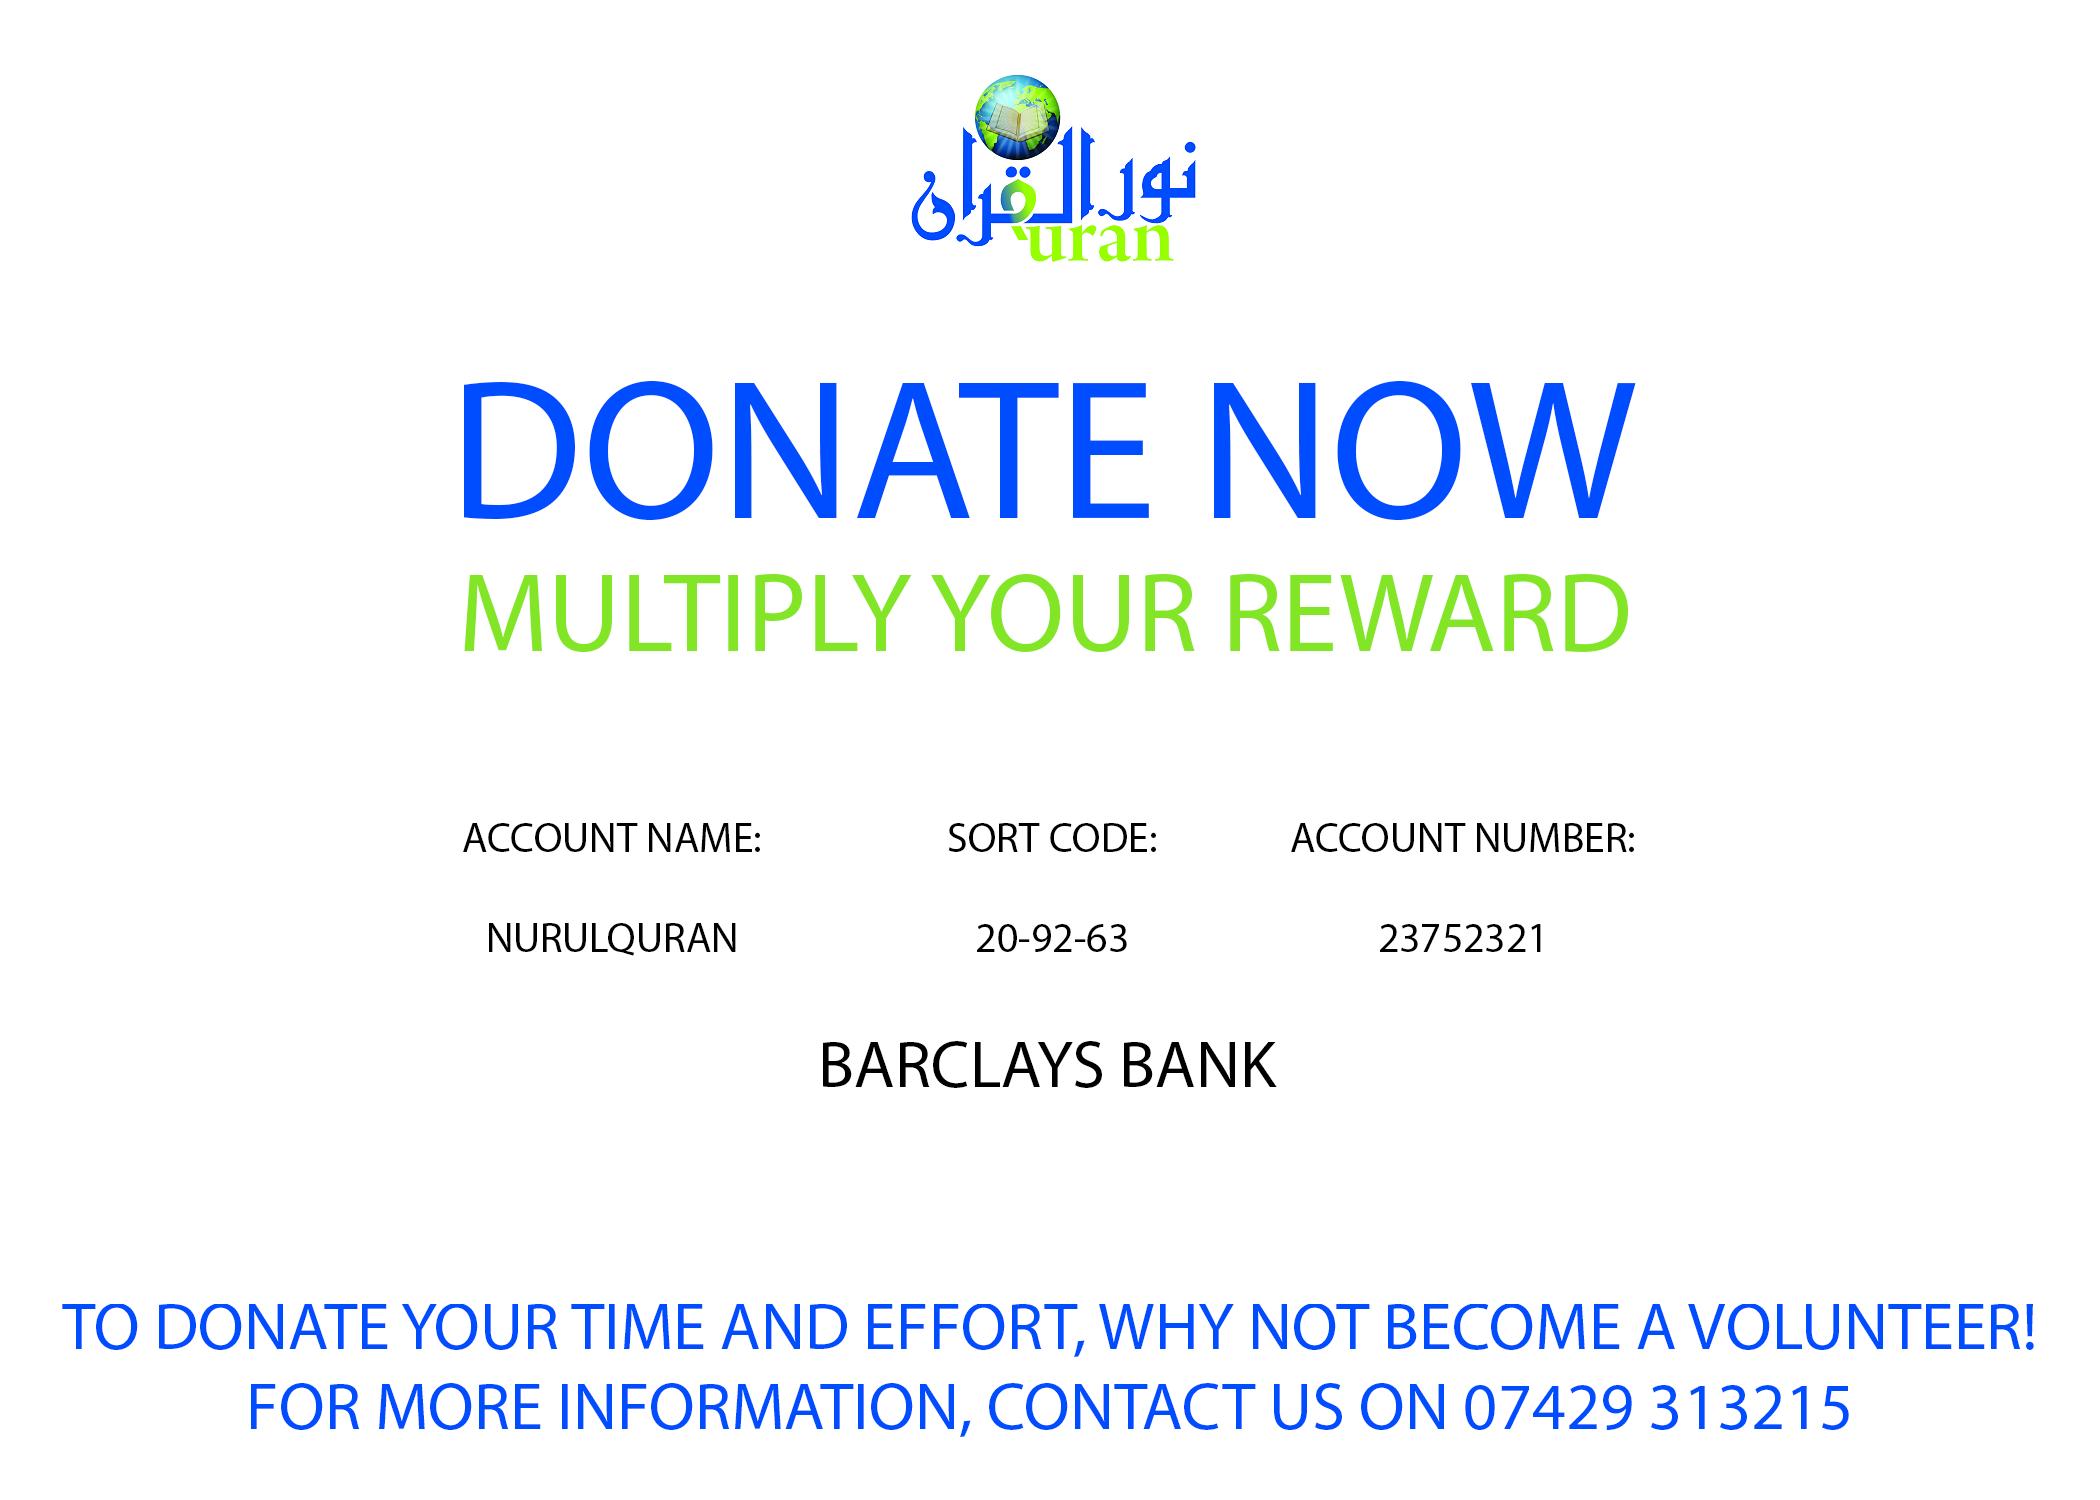 Multiply your reward